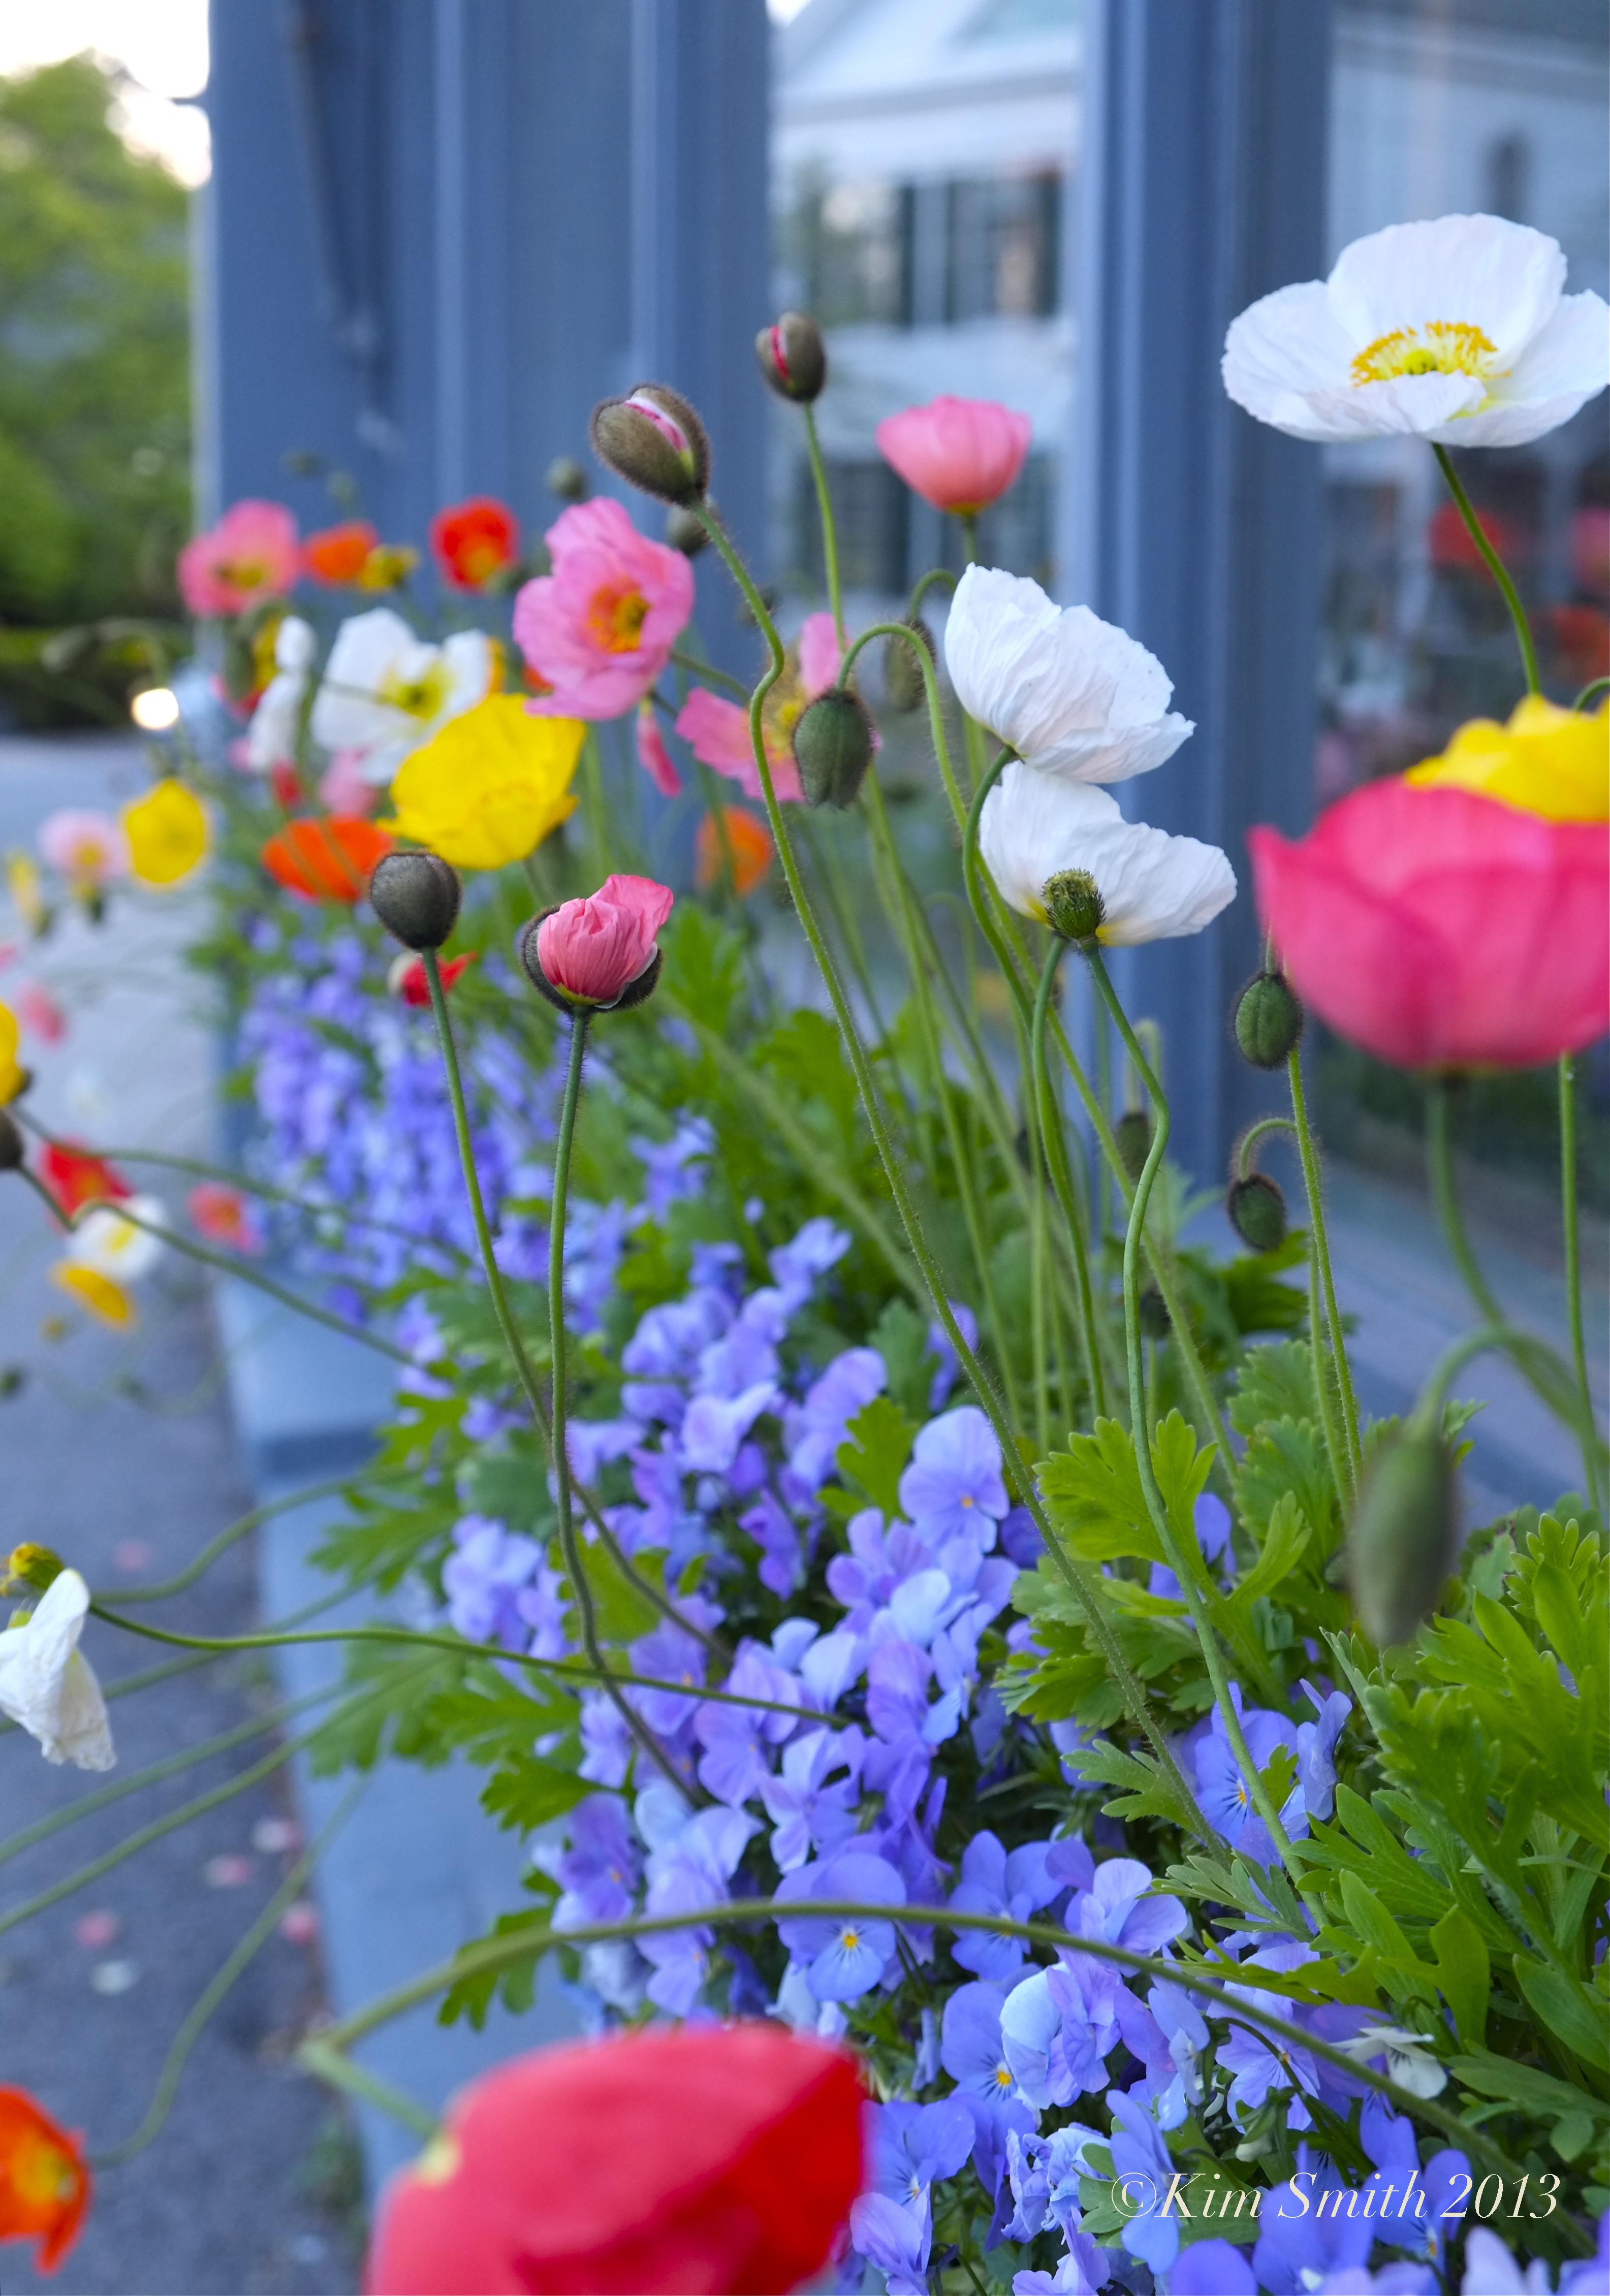 Design inspiration iceland poppies kim smith designs iceland poppies mightylinksfo